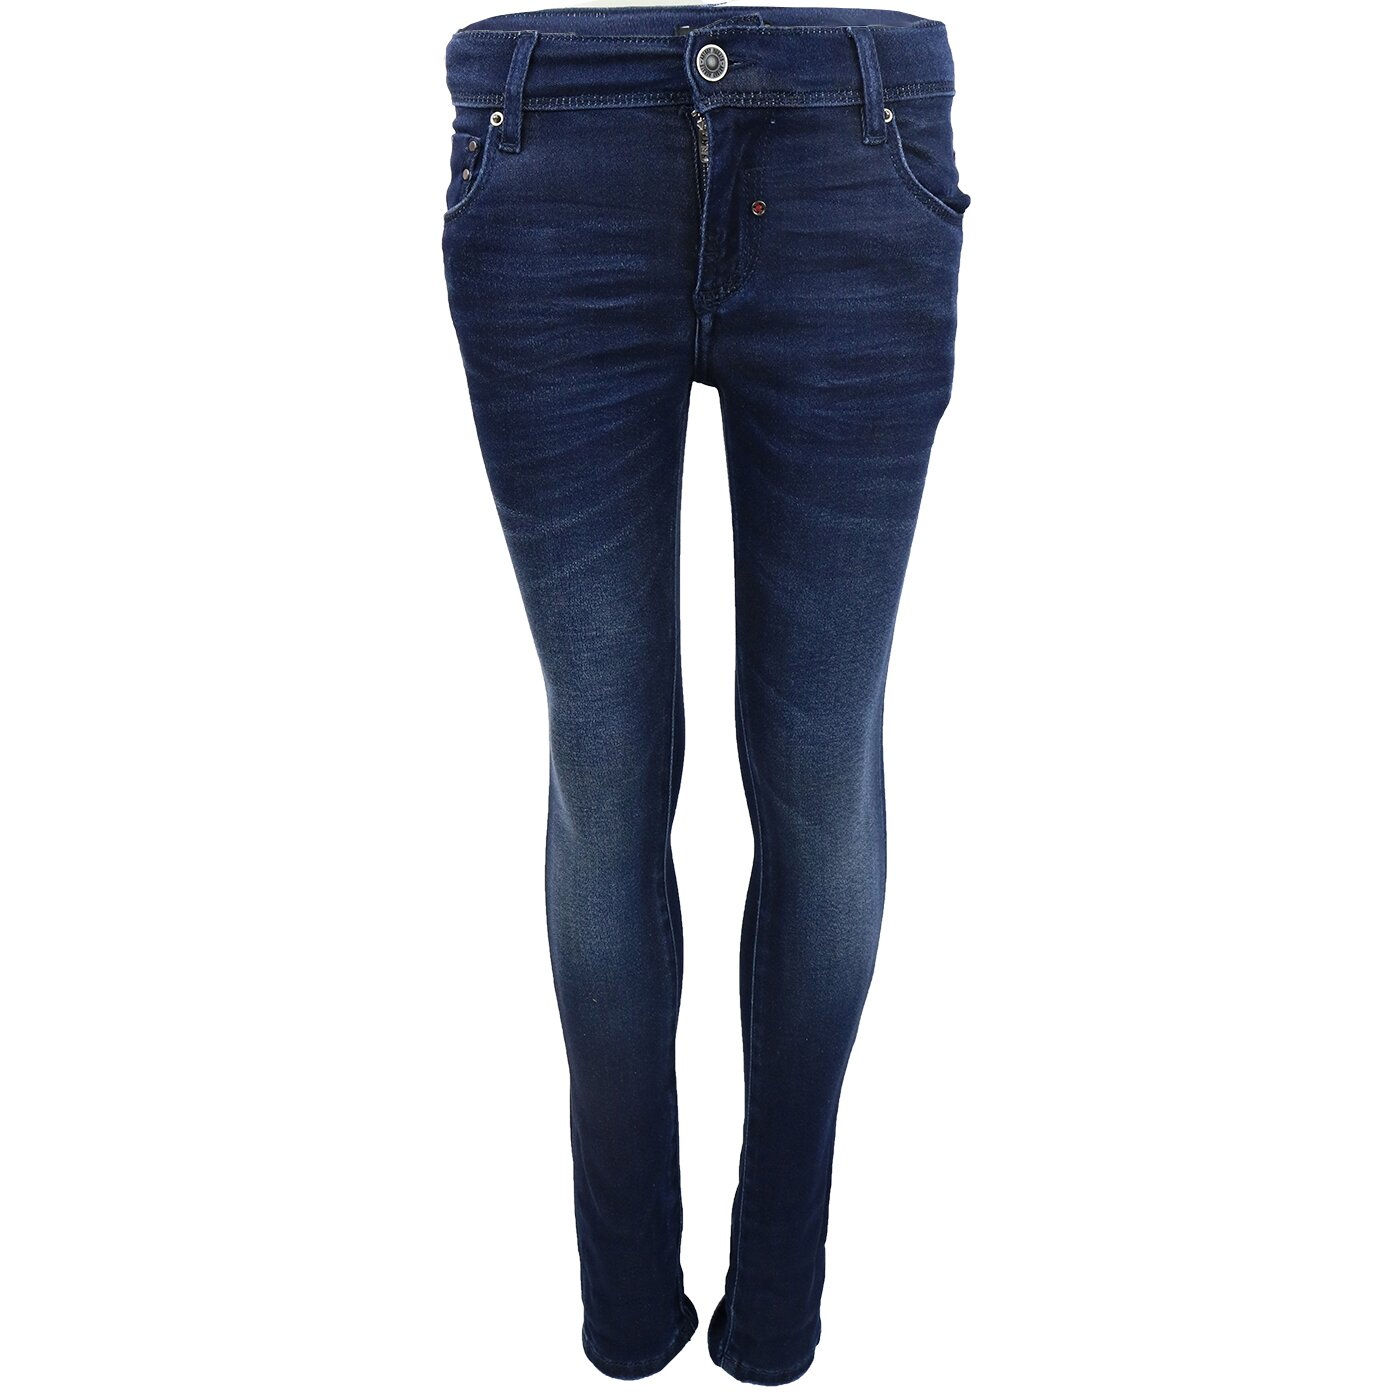 Antony Morato Fighetto Jeans Dark Blue